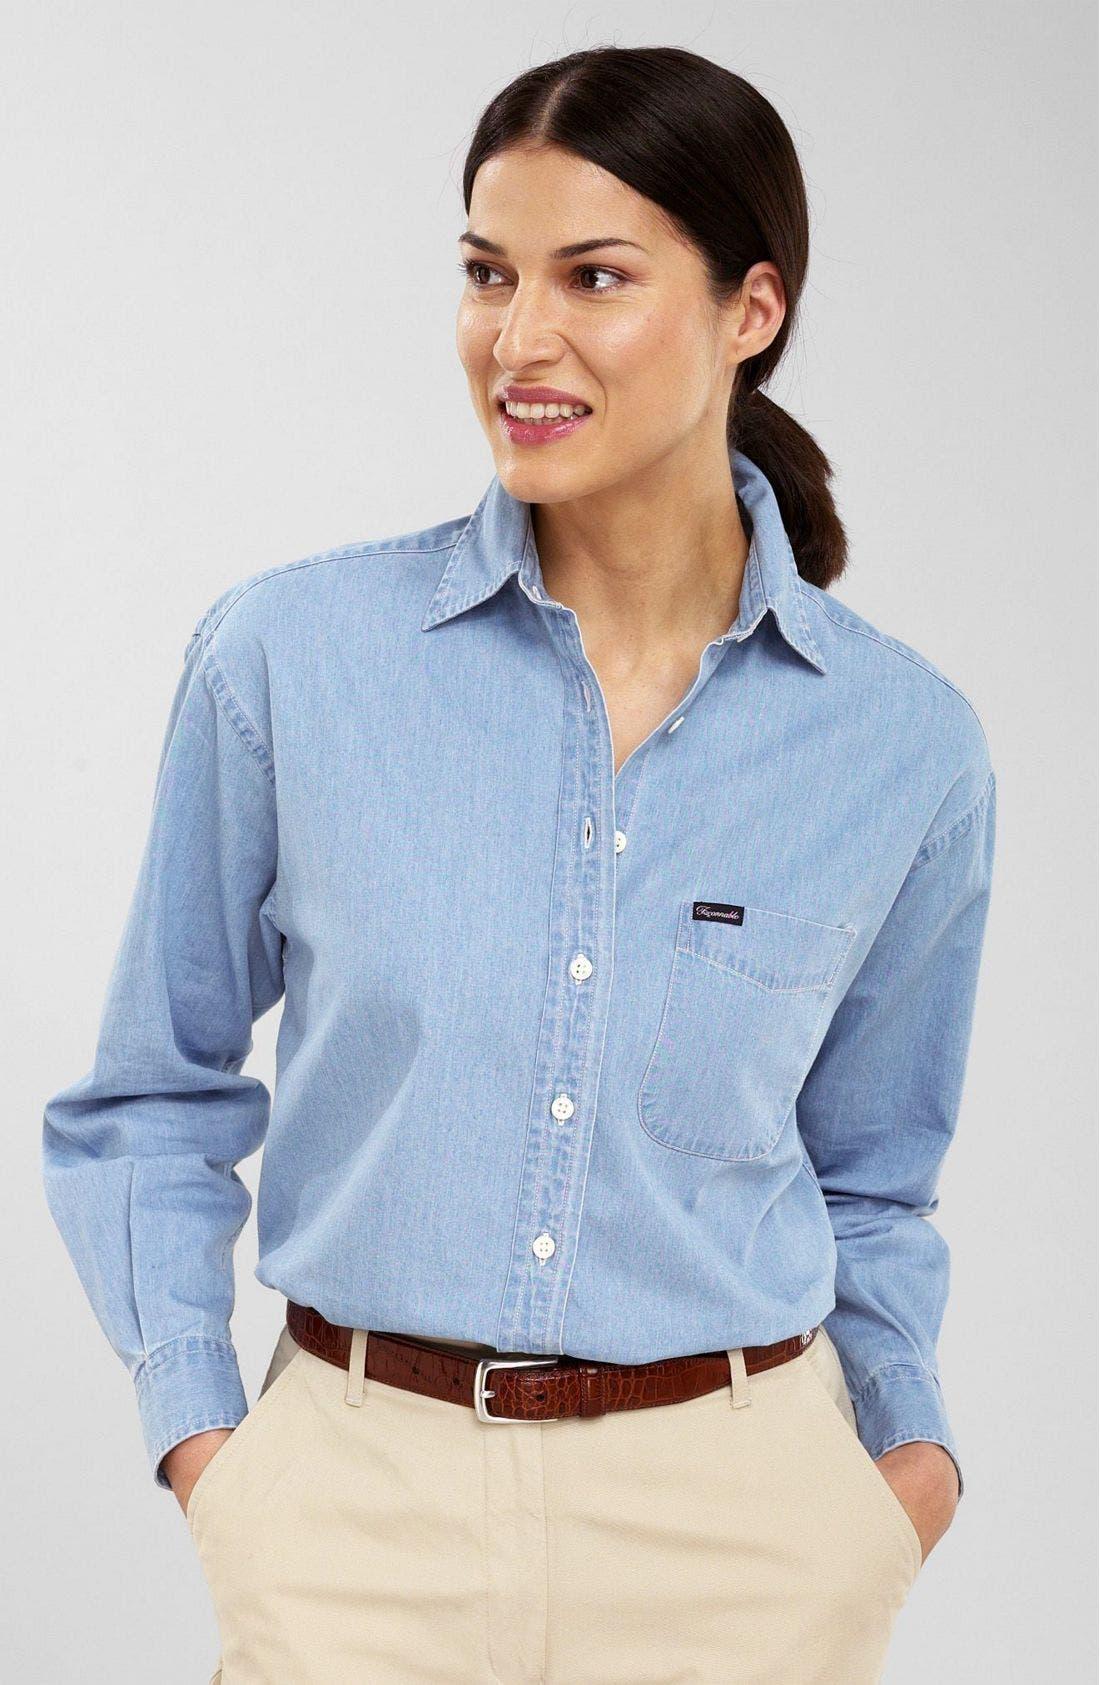 F. FAÇONNABLE Façonnable Chambray Shirt, Main, color, CHA